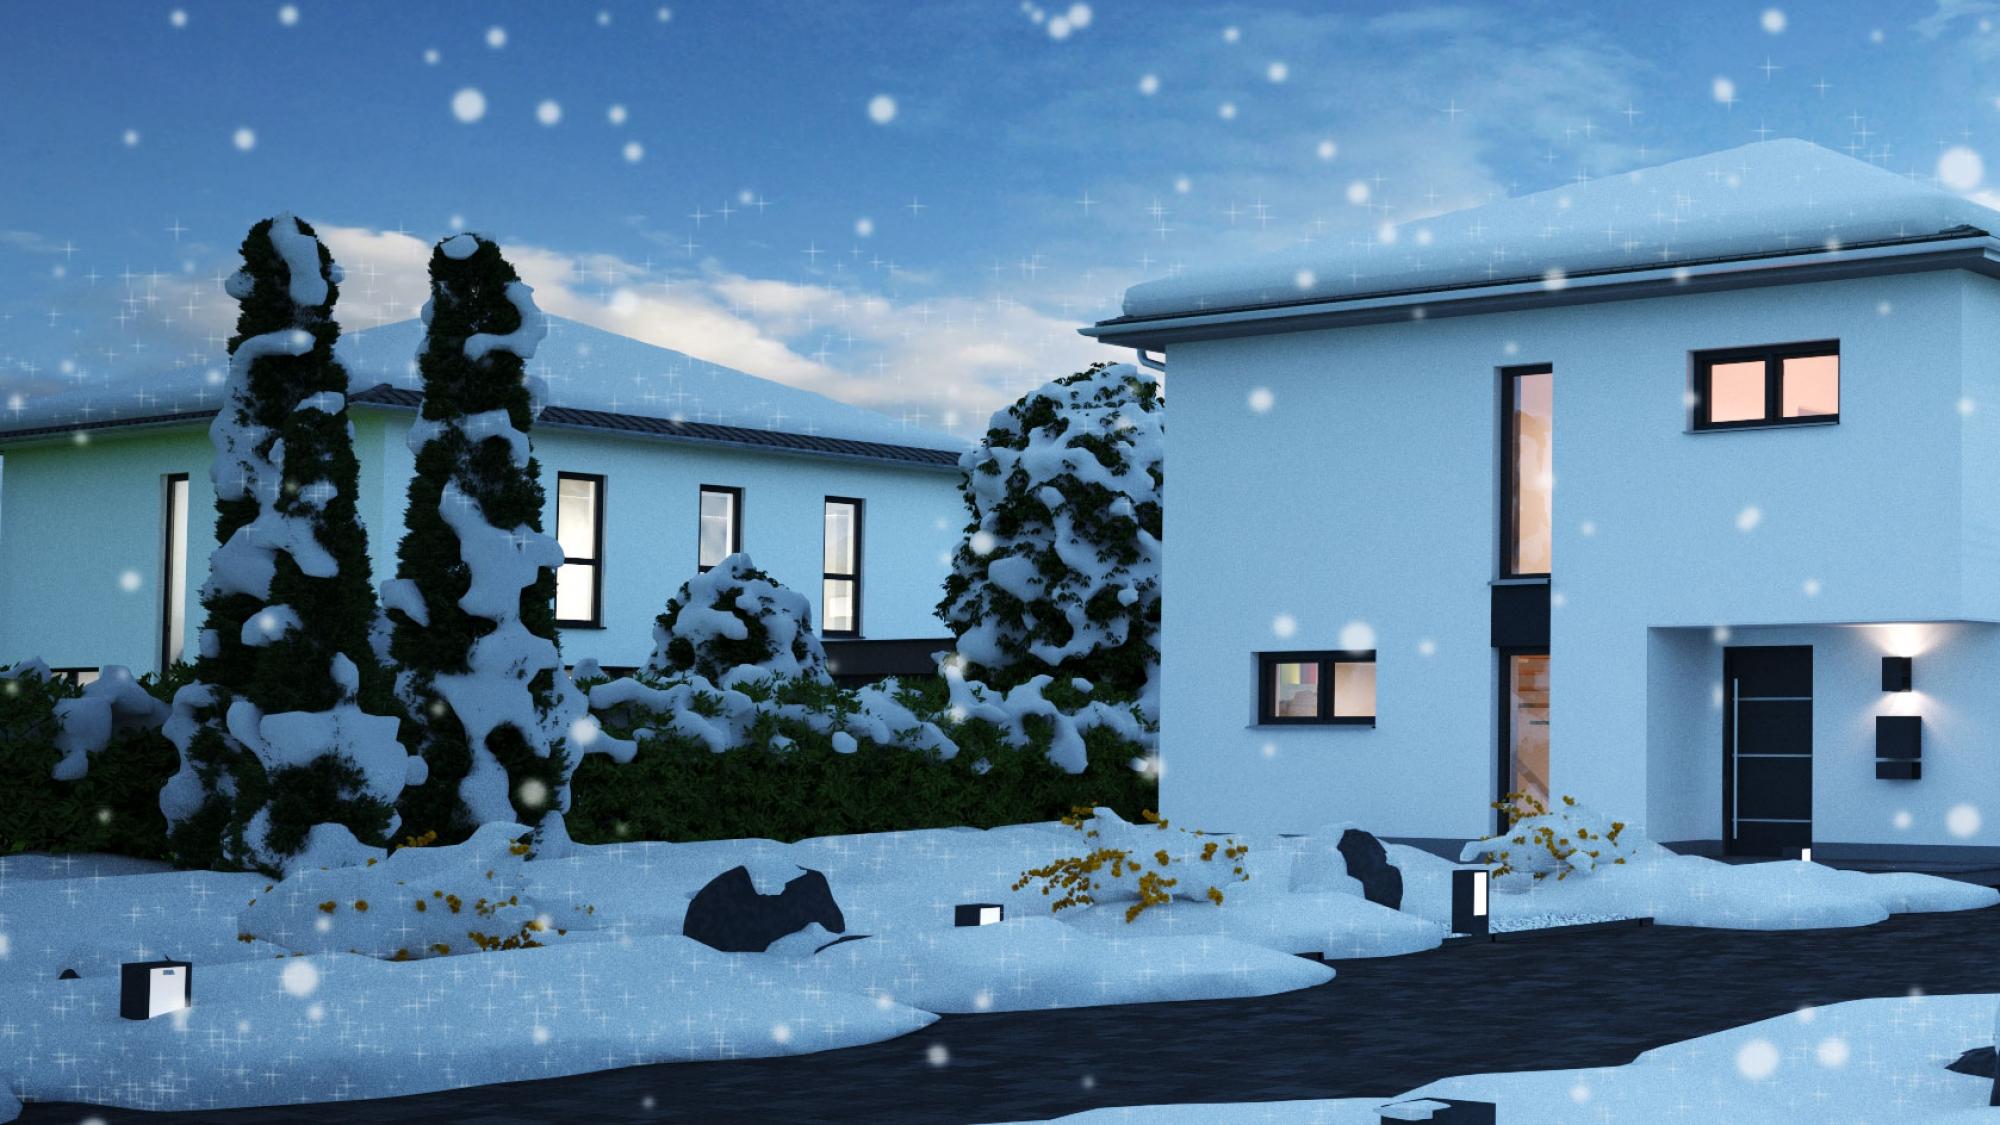 Villa_XL_V1-3_nacht-schnee_nacht-snow_1_0000